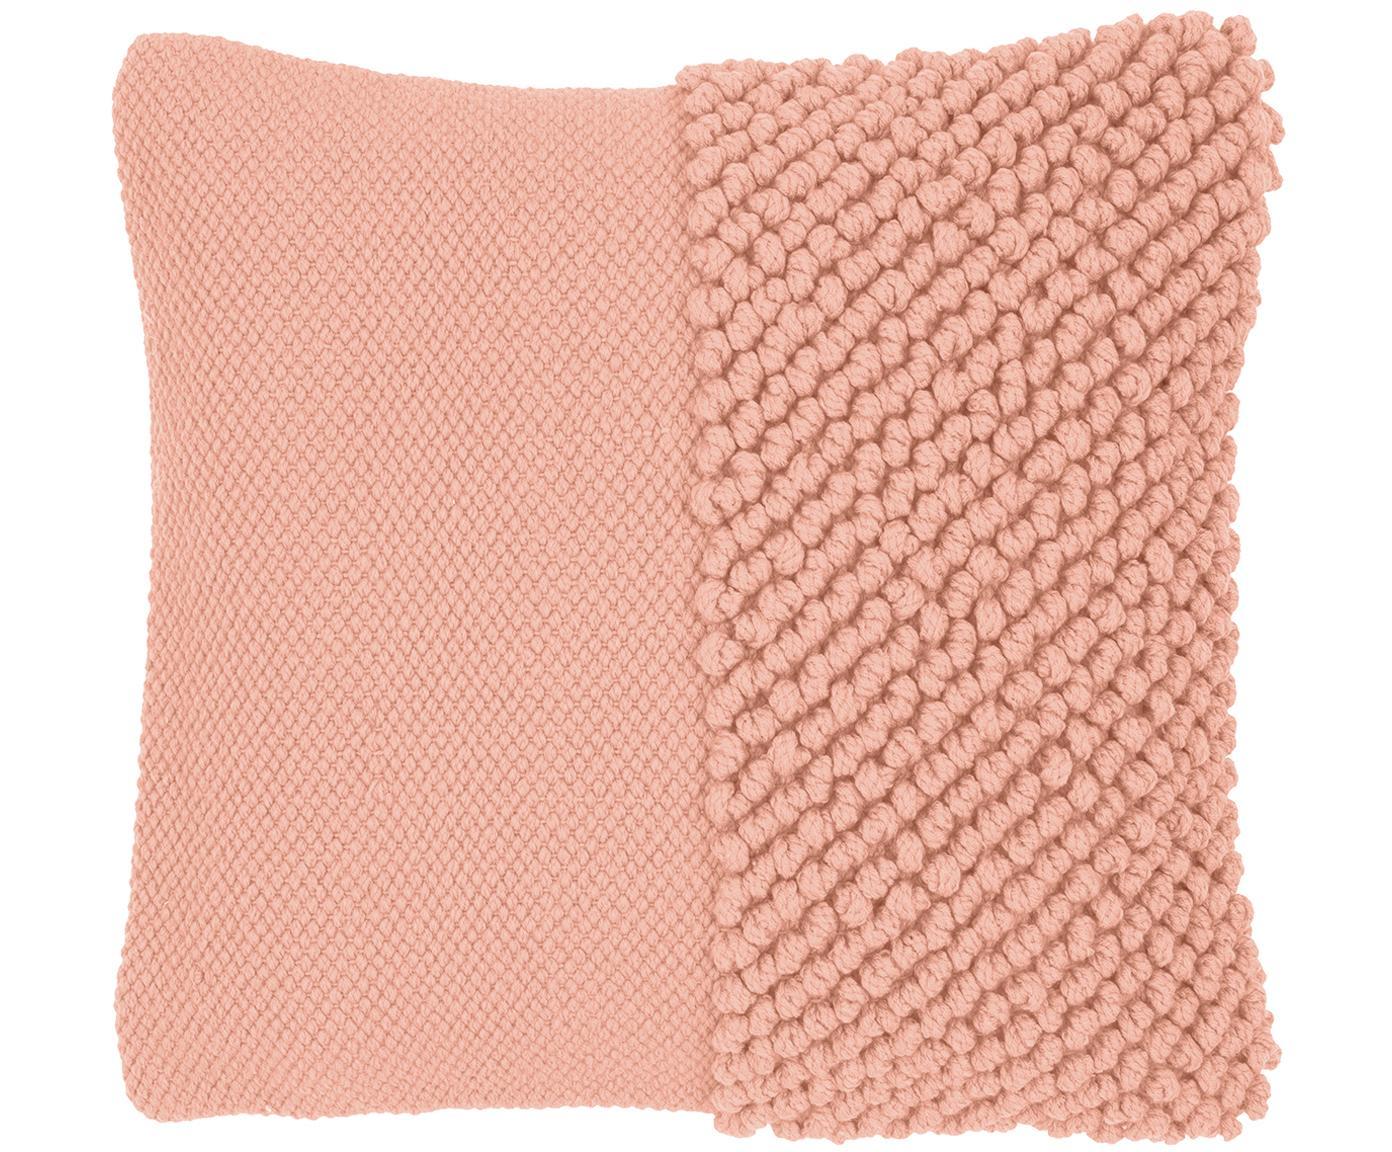 Kissenhülle Andi mit strukturierter Oberfläche, 80% Acryl, 20% Baumwolle, Apricot, 40 x 40 cm